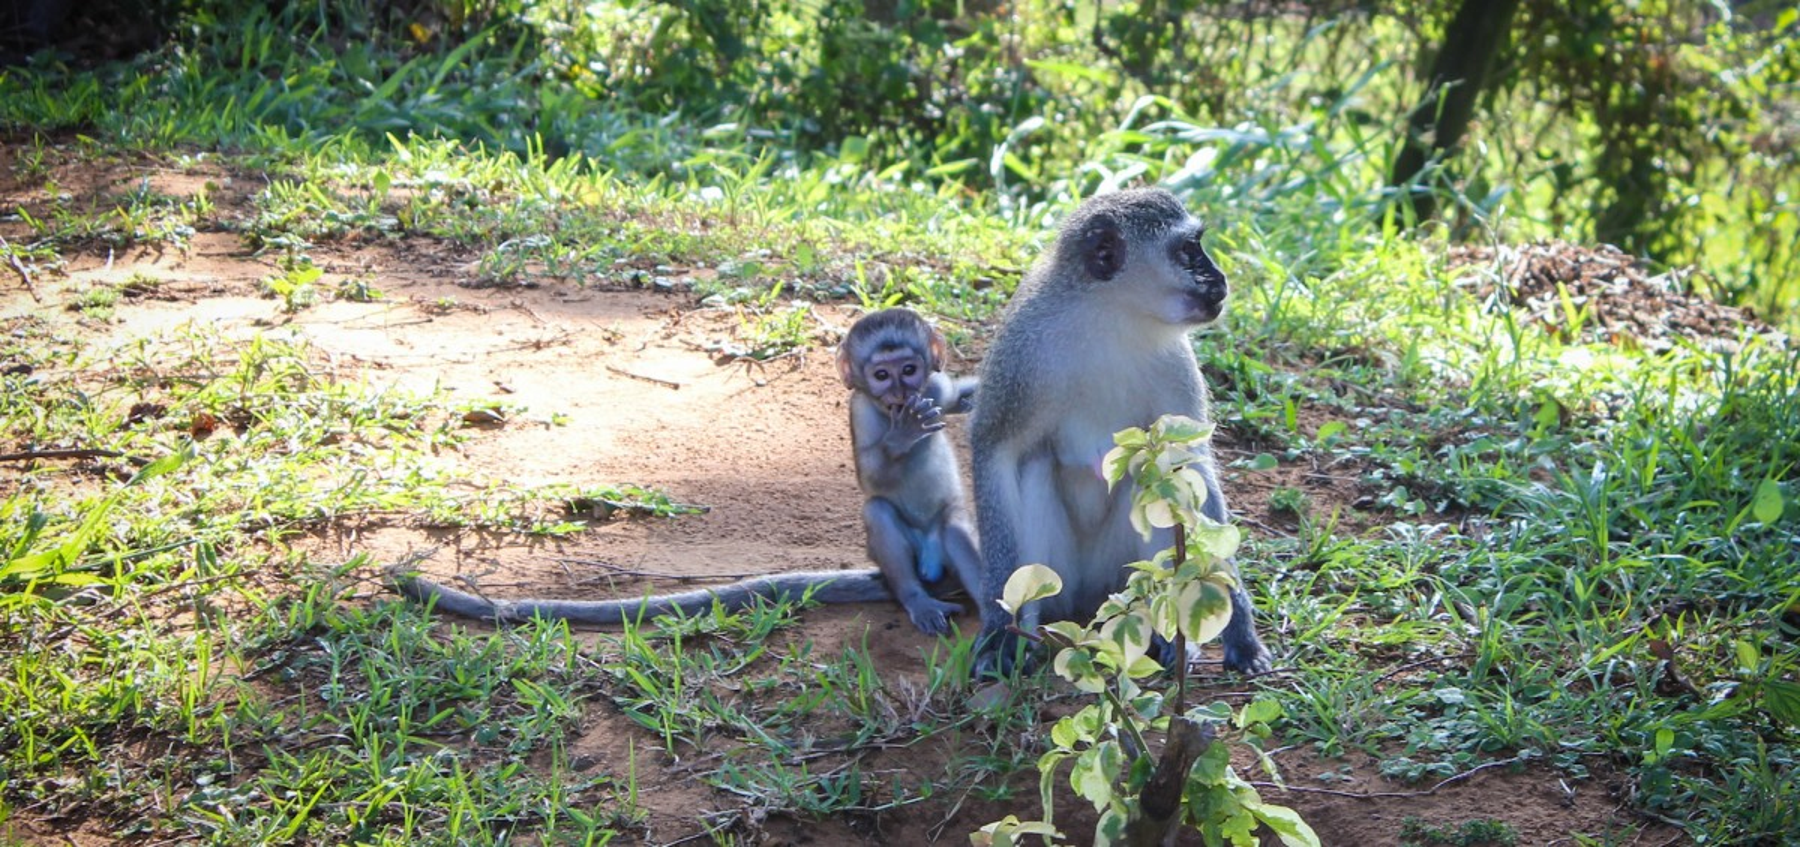 iSimangaliso Wetland Park_Vervet Monkey